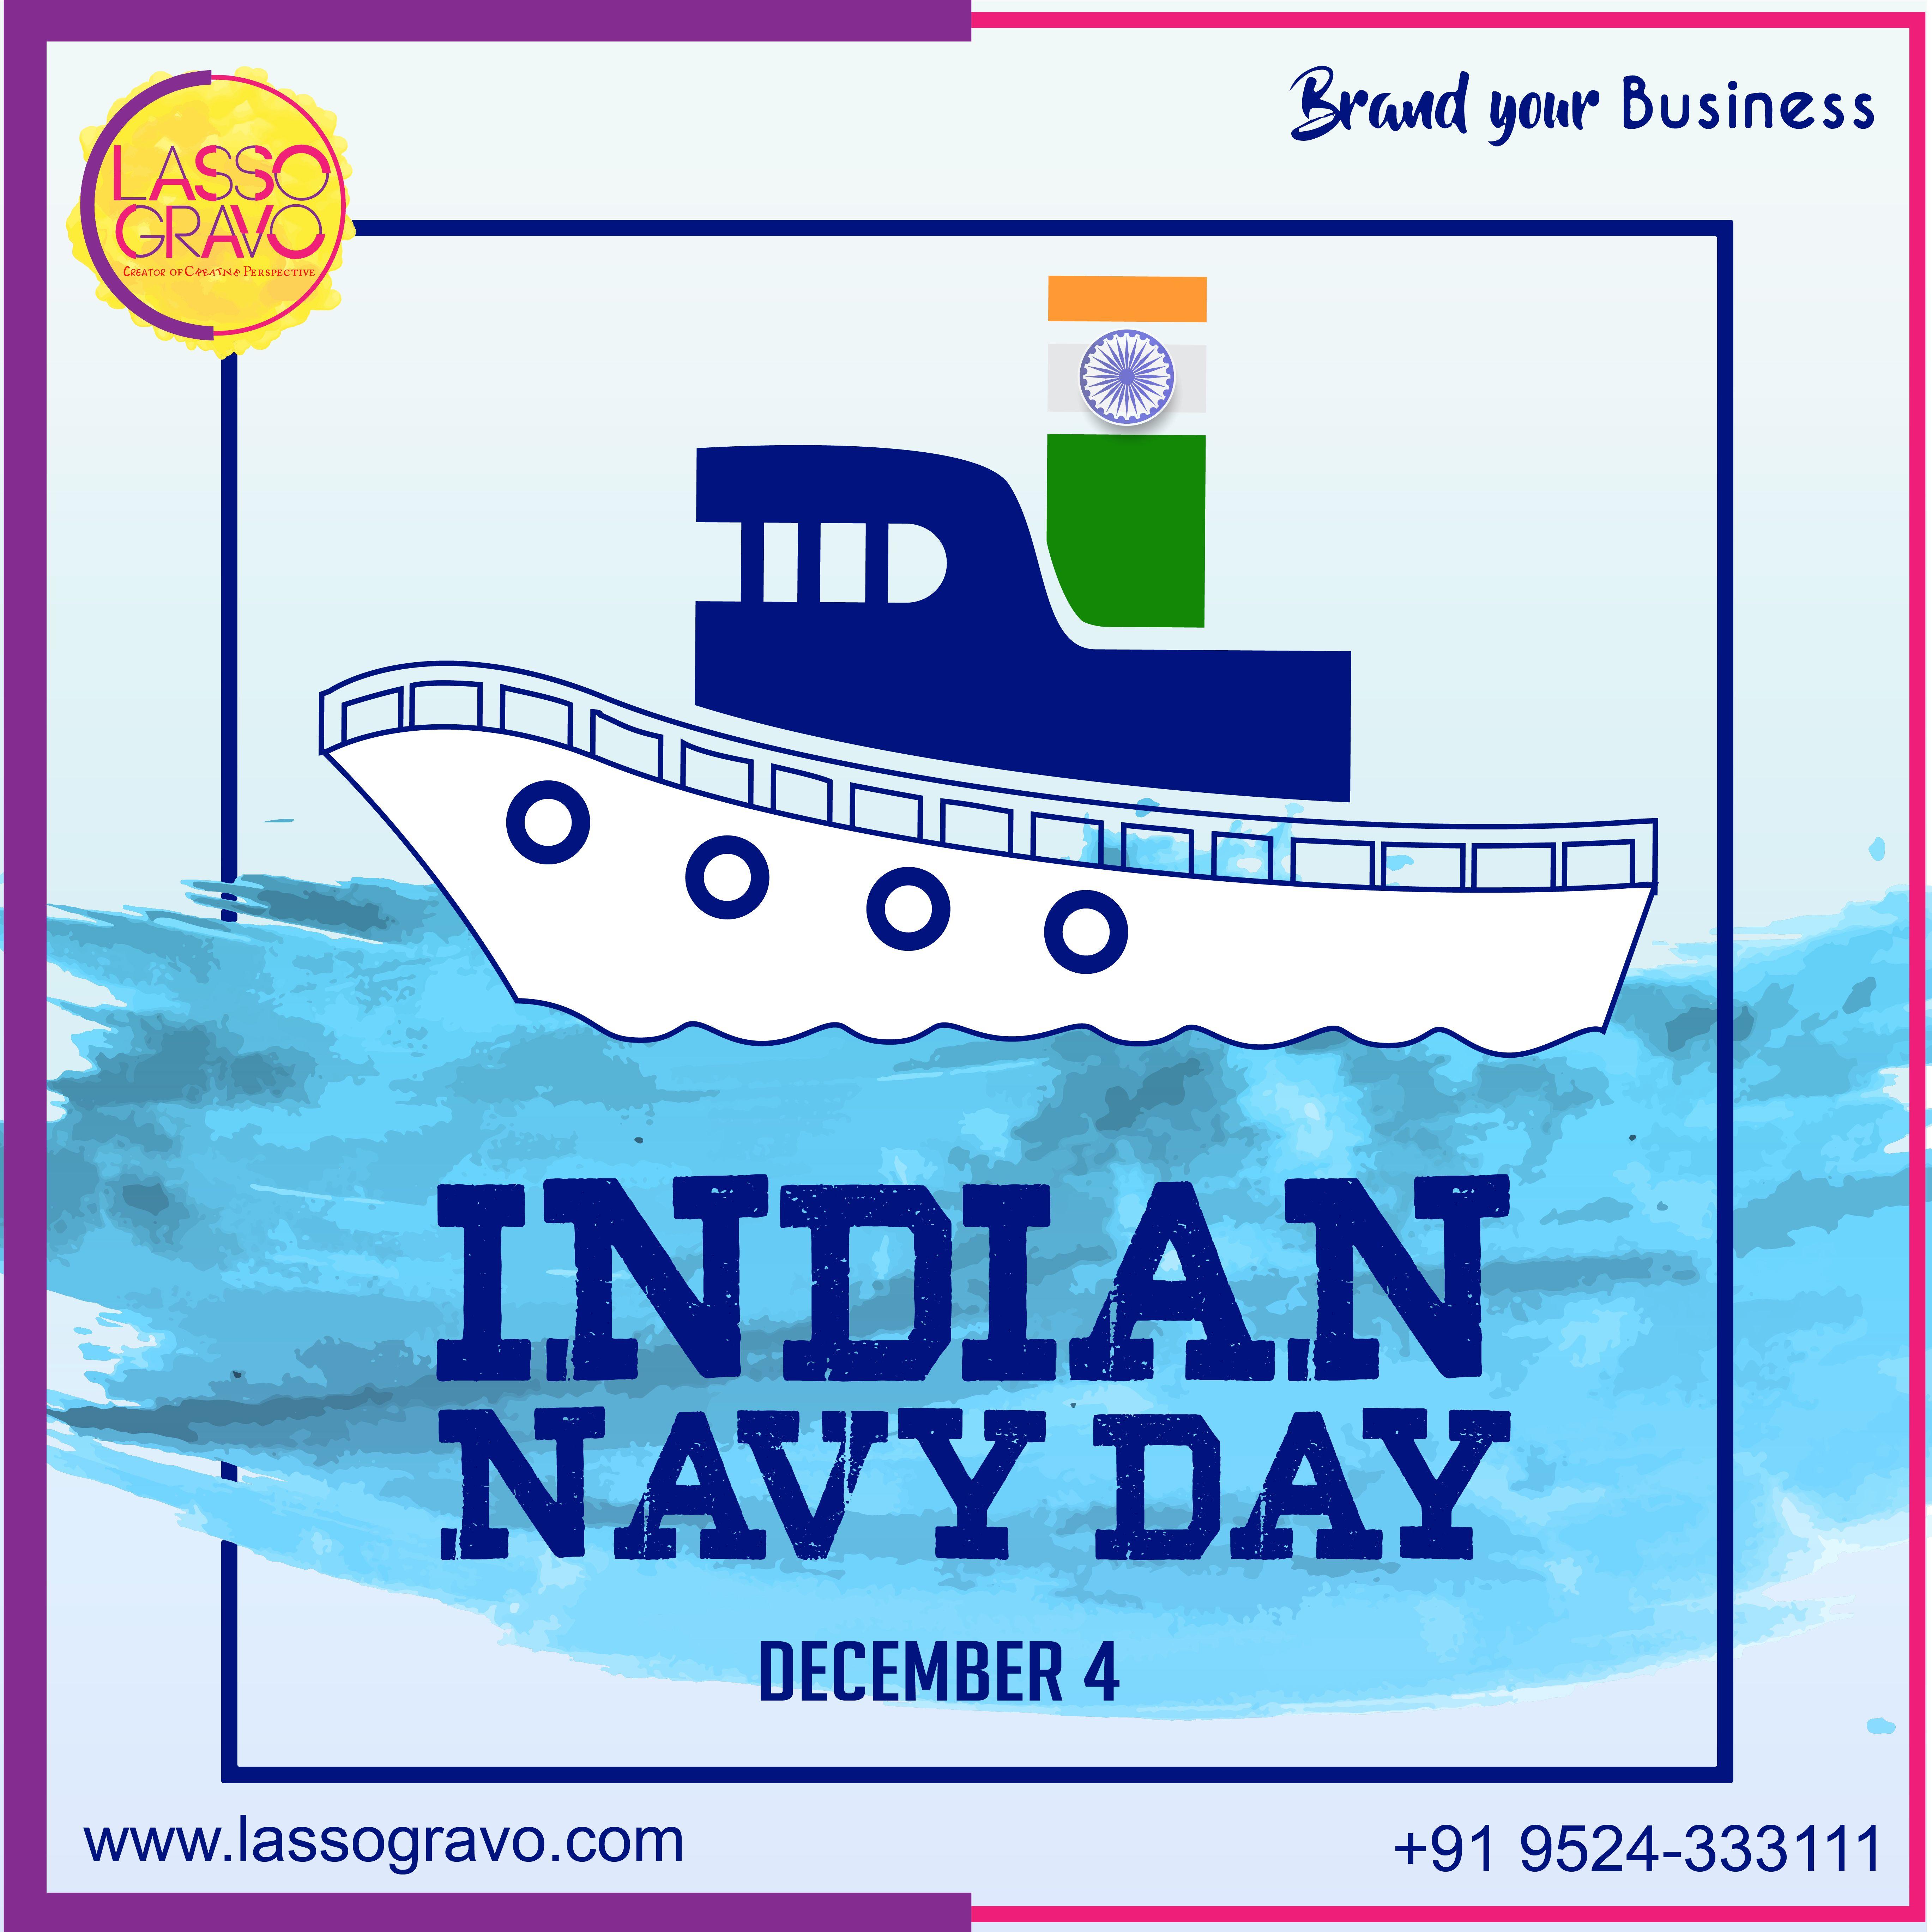 Indian Navy Day Navy Day Indian Navy Day Indian Navy